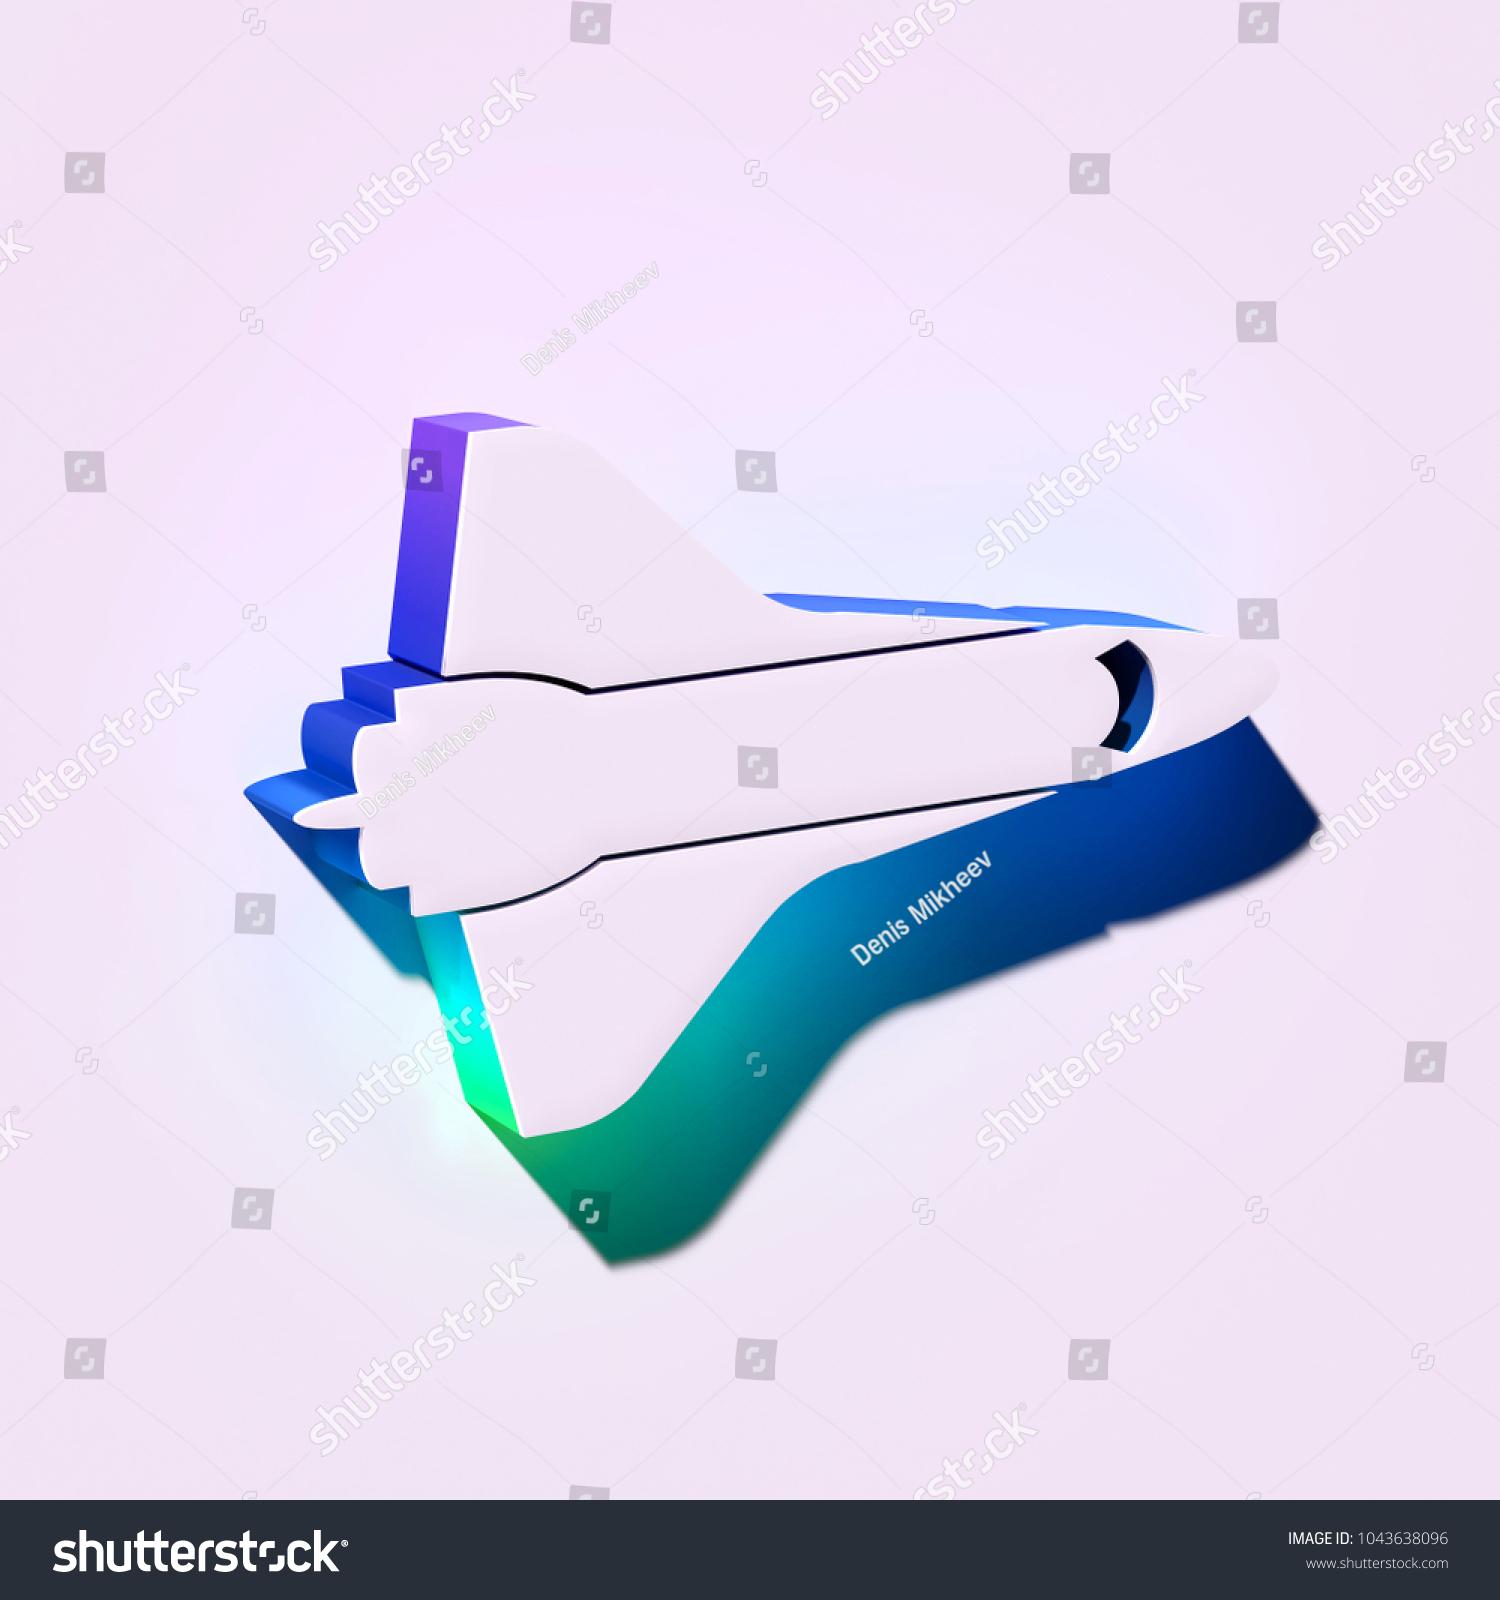 Stupendous White Fighter Jet Icon 3 D Illustration Stock Illustration Royalty Wiring Digital Resources Funapmognl